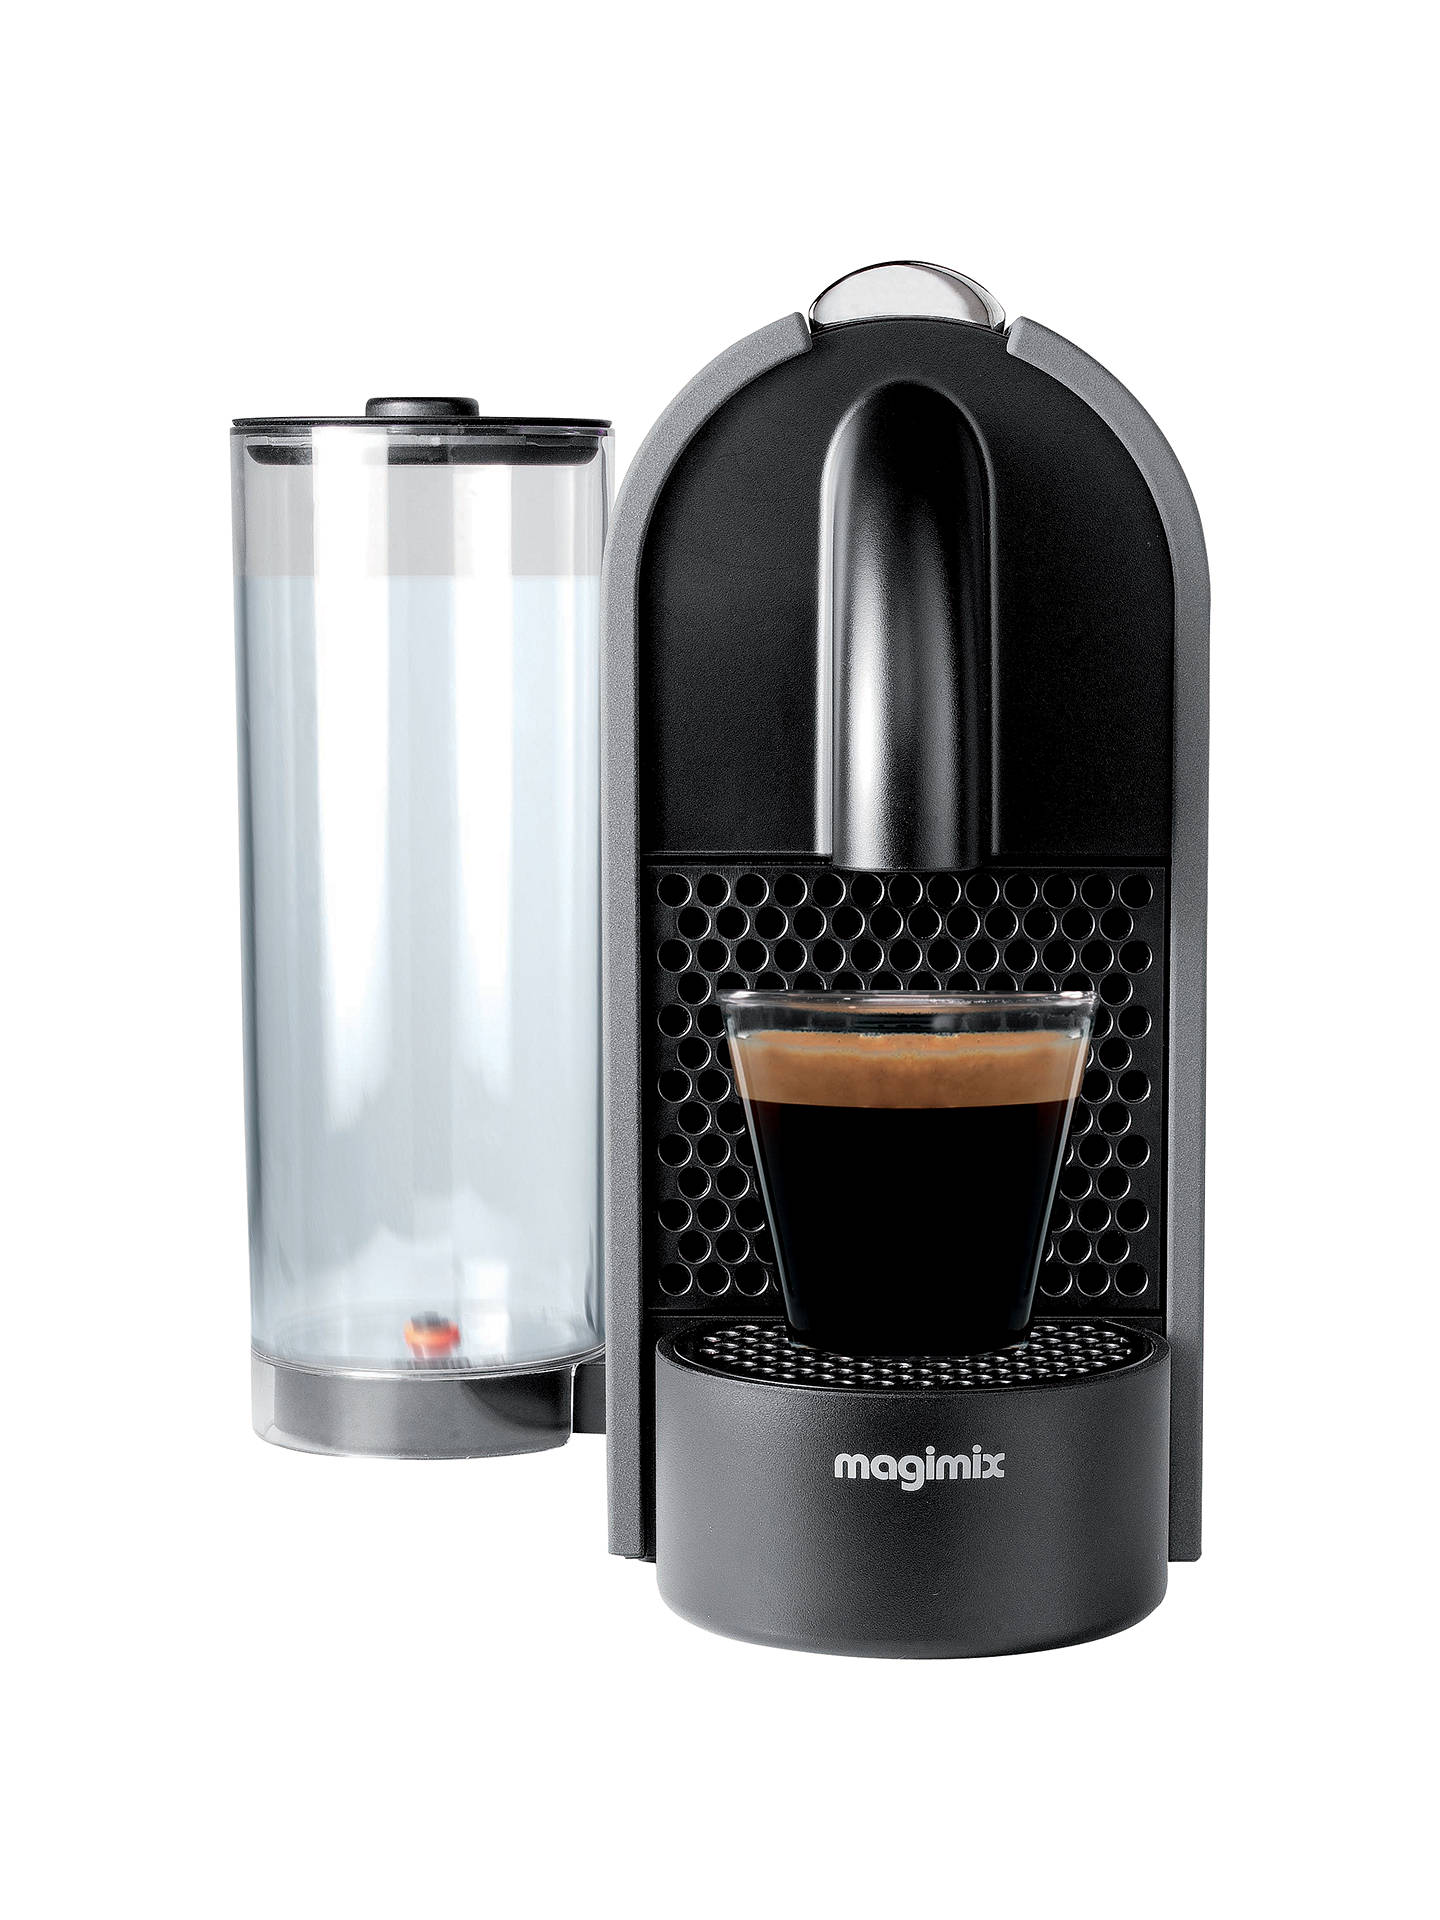 nespresso u coffee machine by magimix matt grey at john. Black Bedroom Furniture Sets. Home Design Ideas